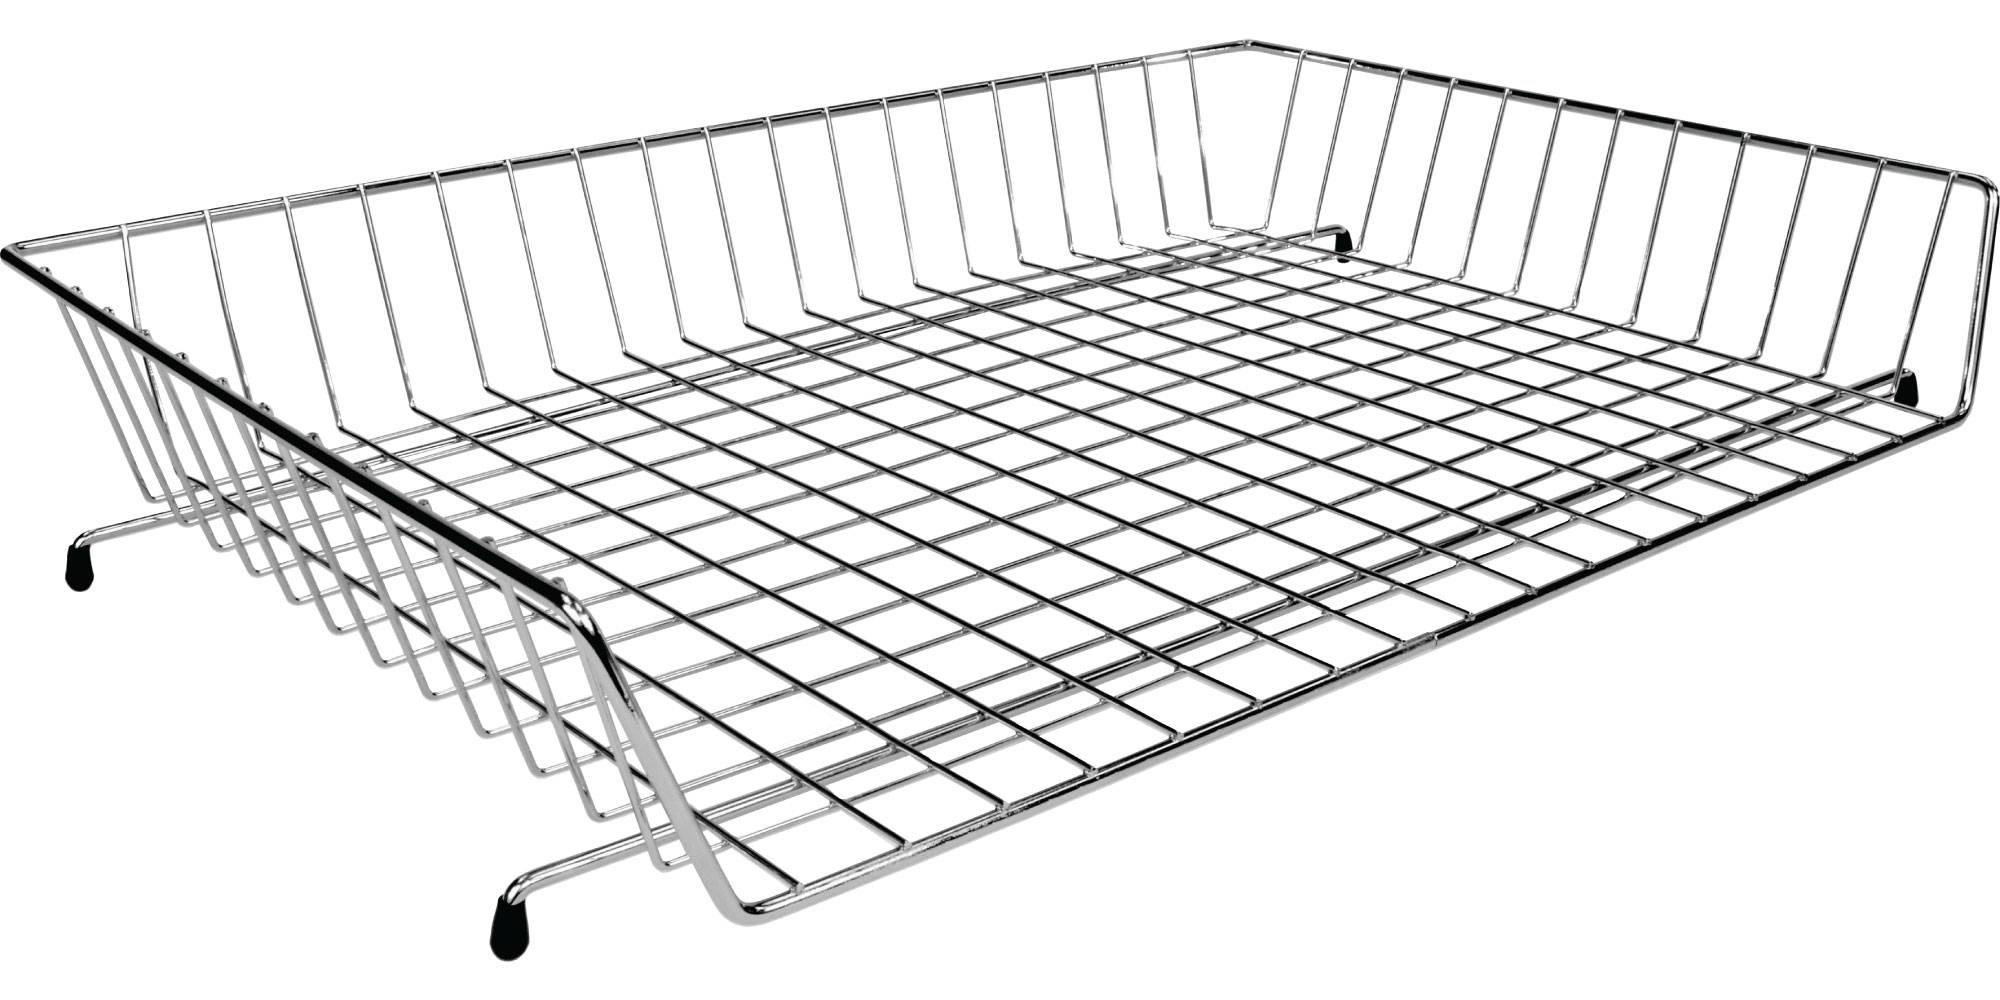 Fabulous 11X17 Wire Basket Desk Trays For Office Organization Interior Design Ideas Grebswwsoteloinfo